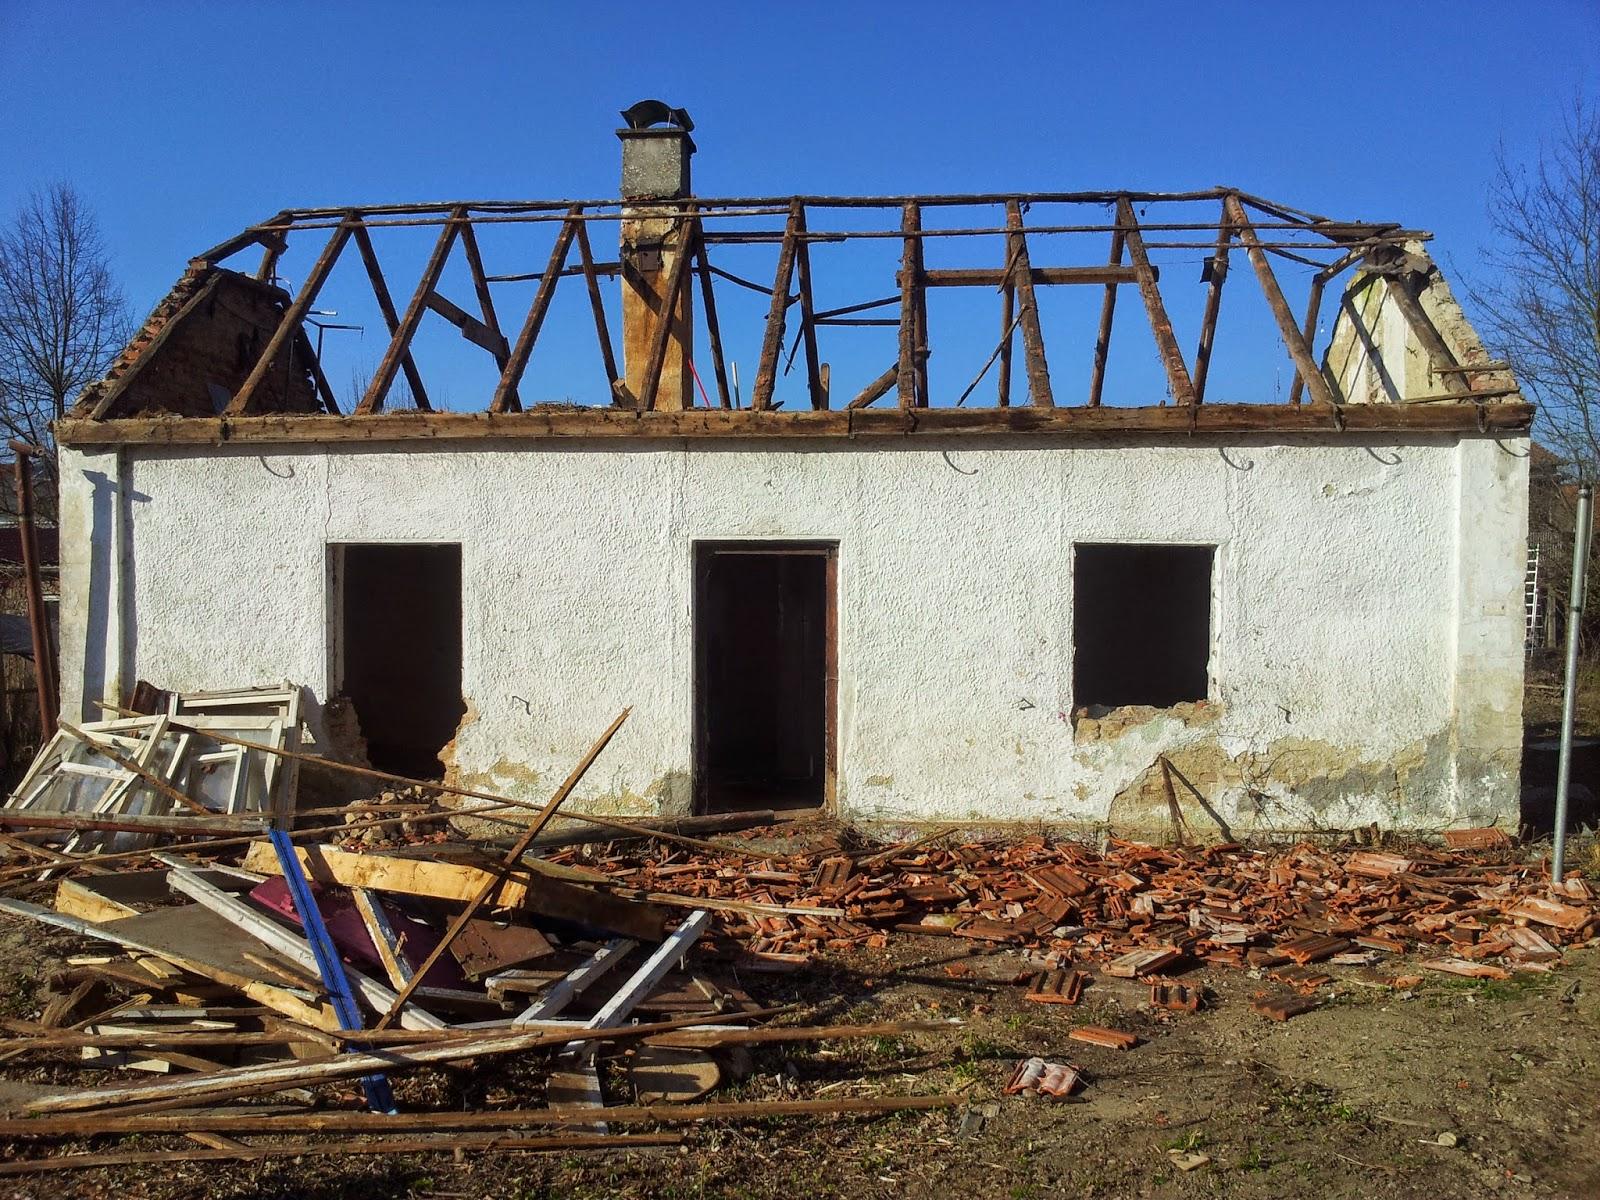 Kmh Haus hausbau mit der firma kmh der abriss